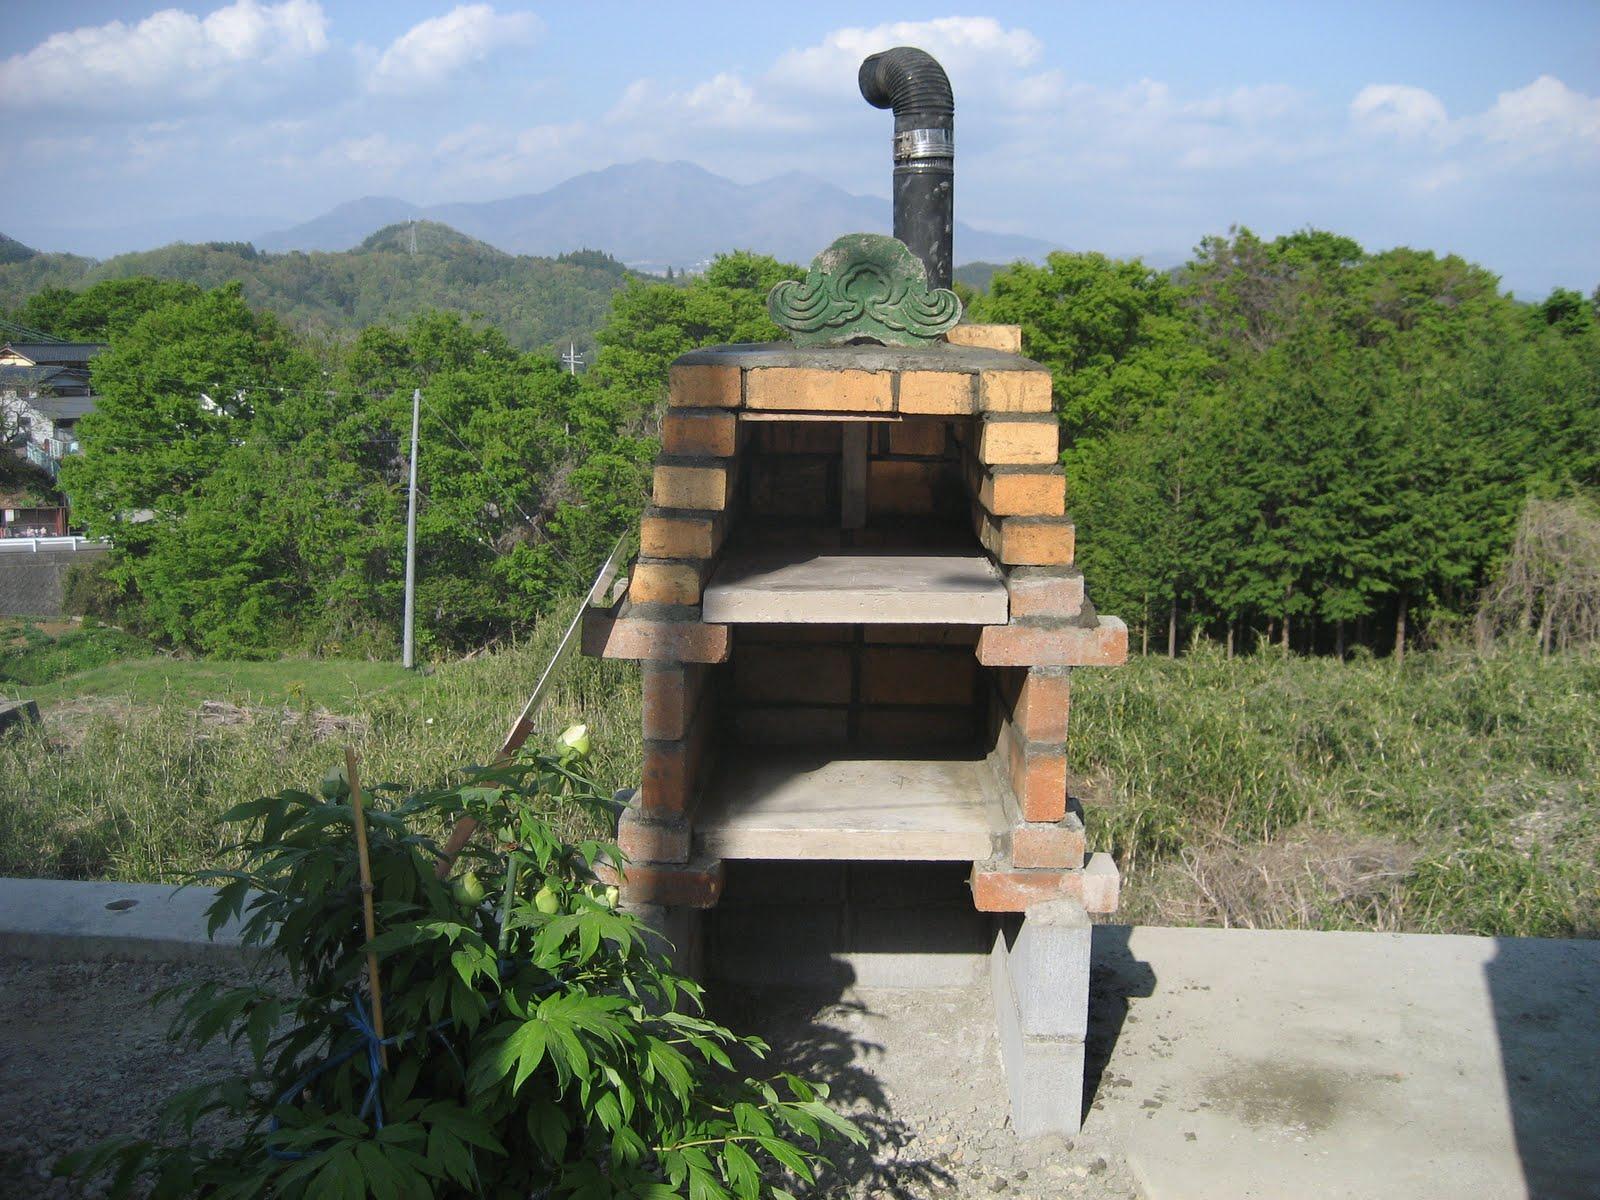 STIHL SHOP: ピザ窯作り